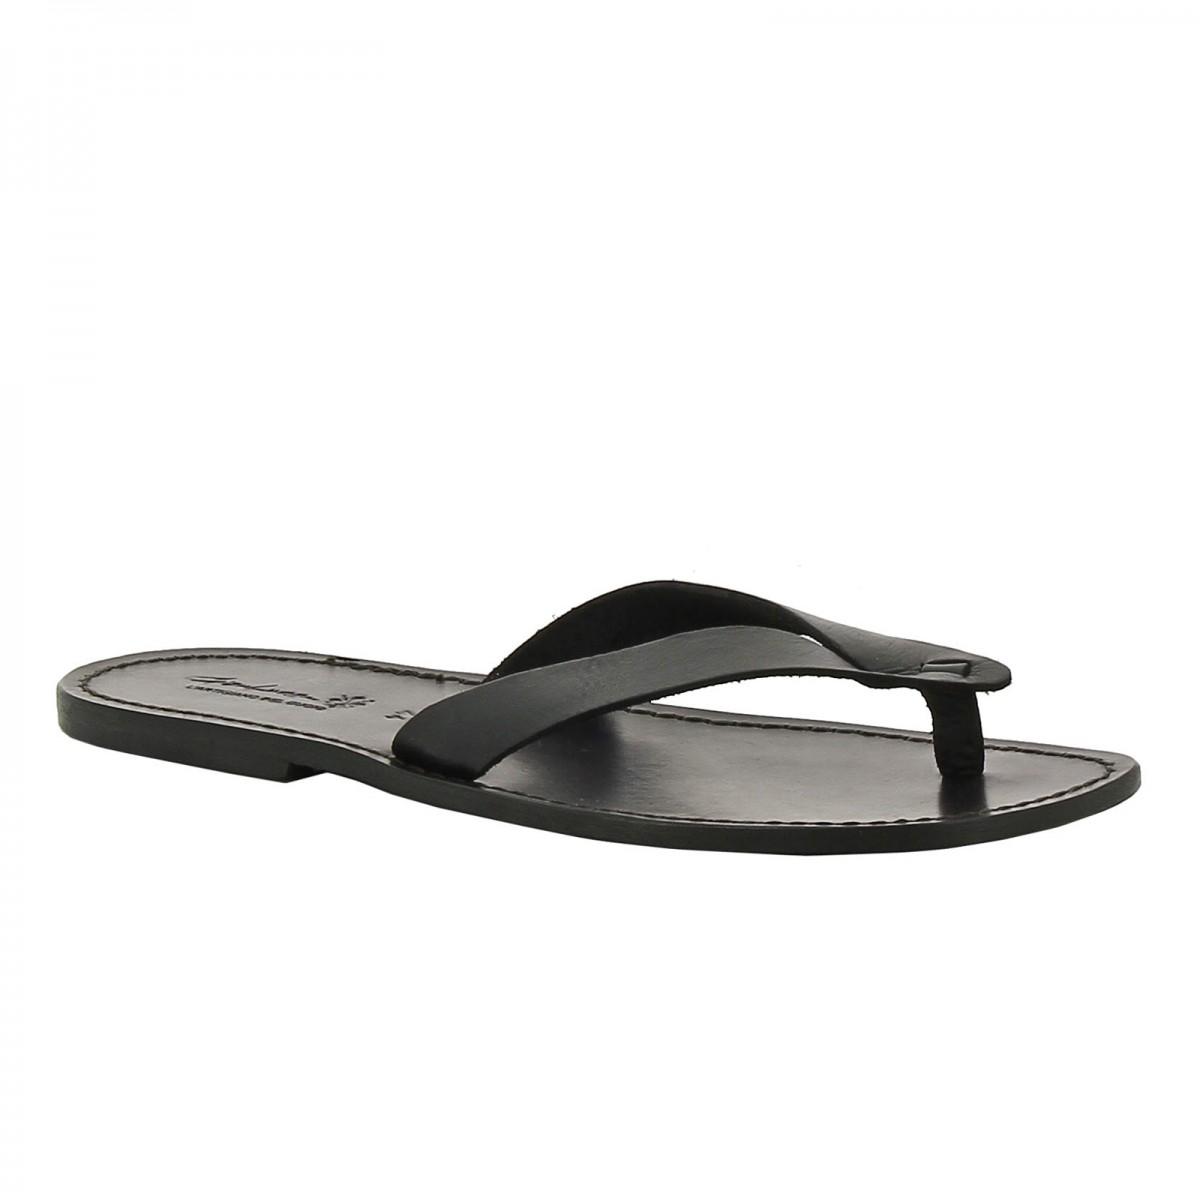 1b7628fee7250d Handgefertigte schwarze flip flops Herren-Sandalen mit Leder-Reimen.  Loading zoom